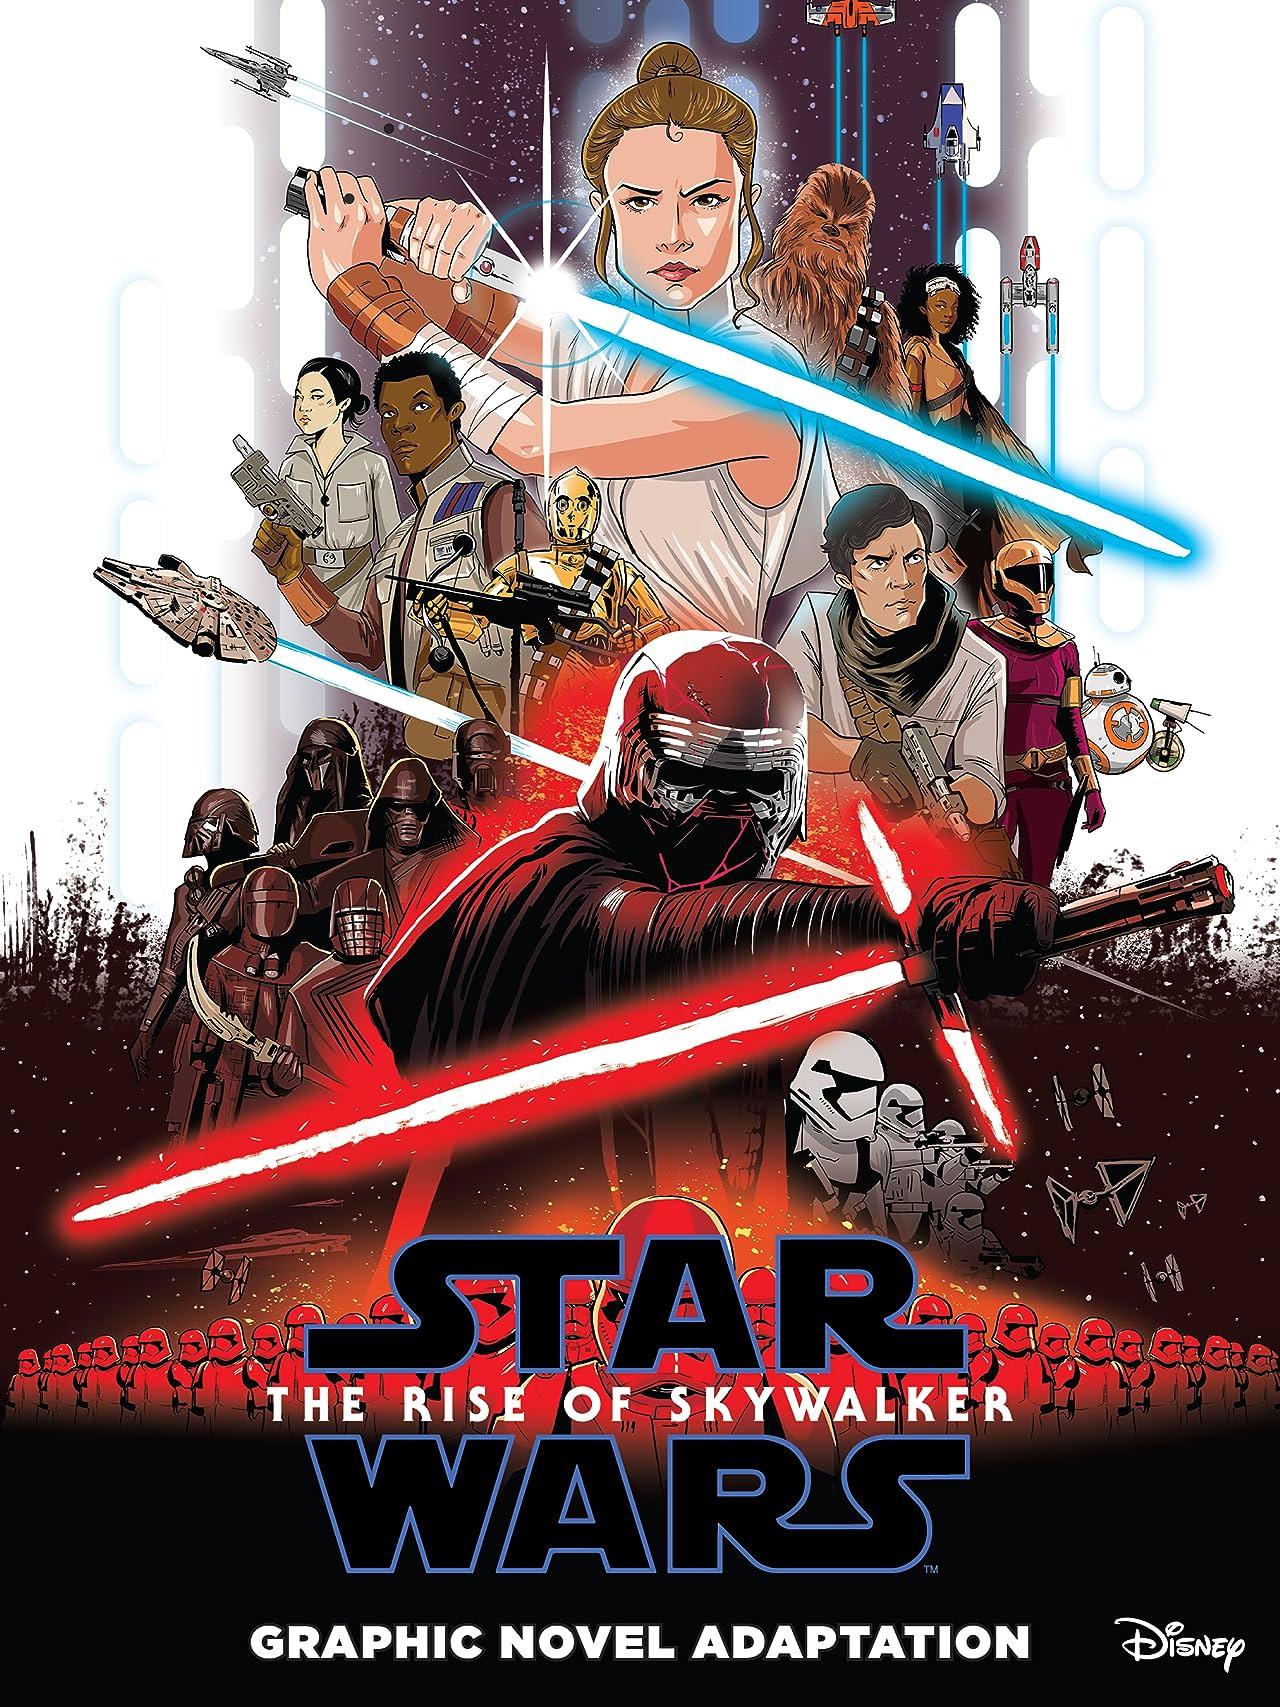 Star Wars: The Rise of Skywalker Graphic Novel Adaptation